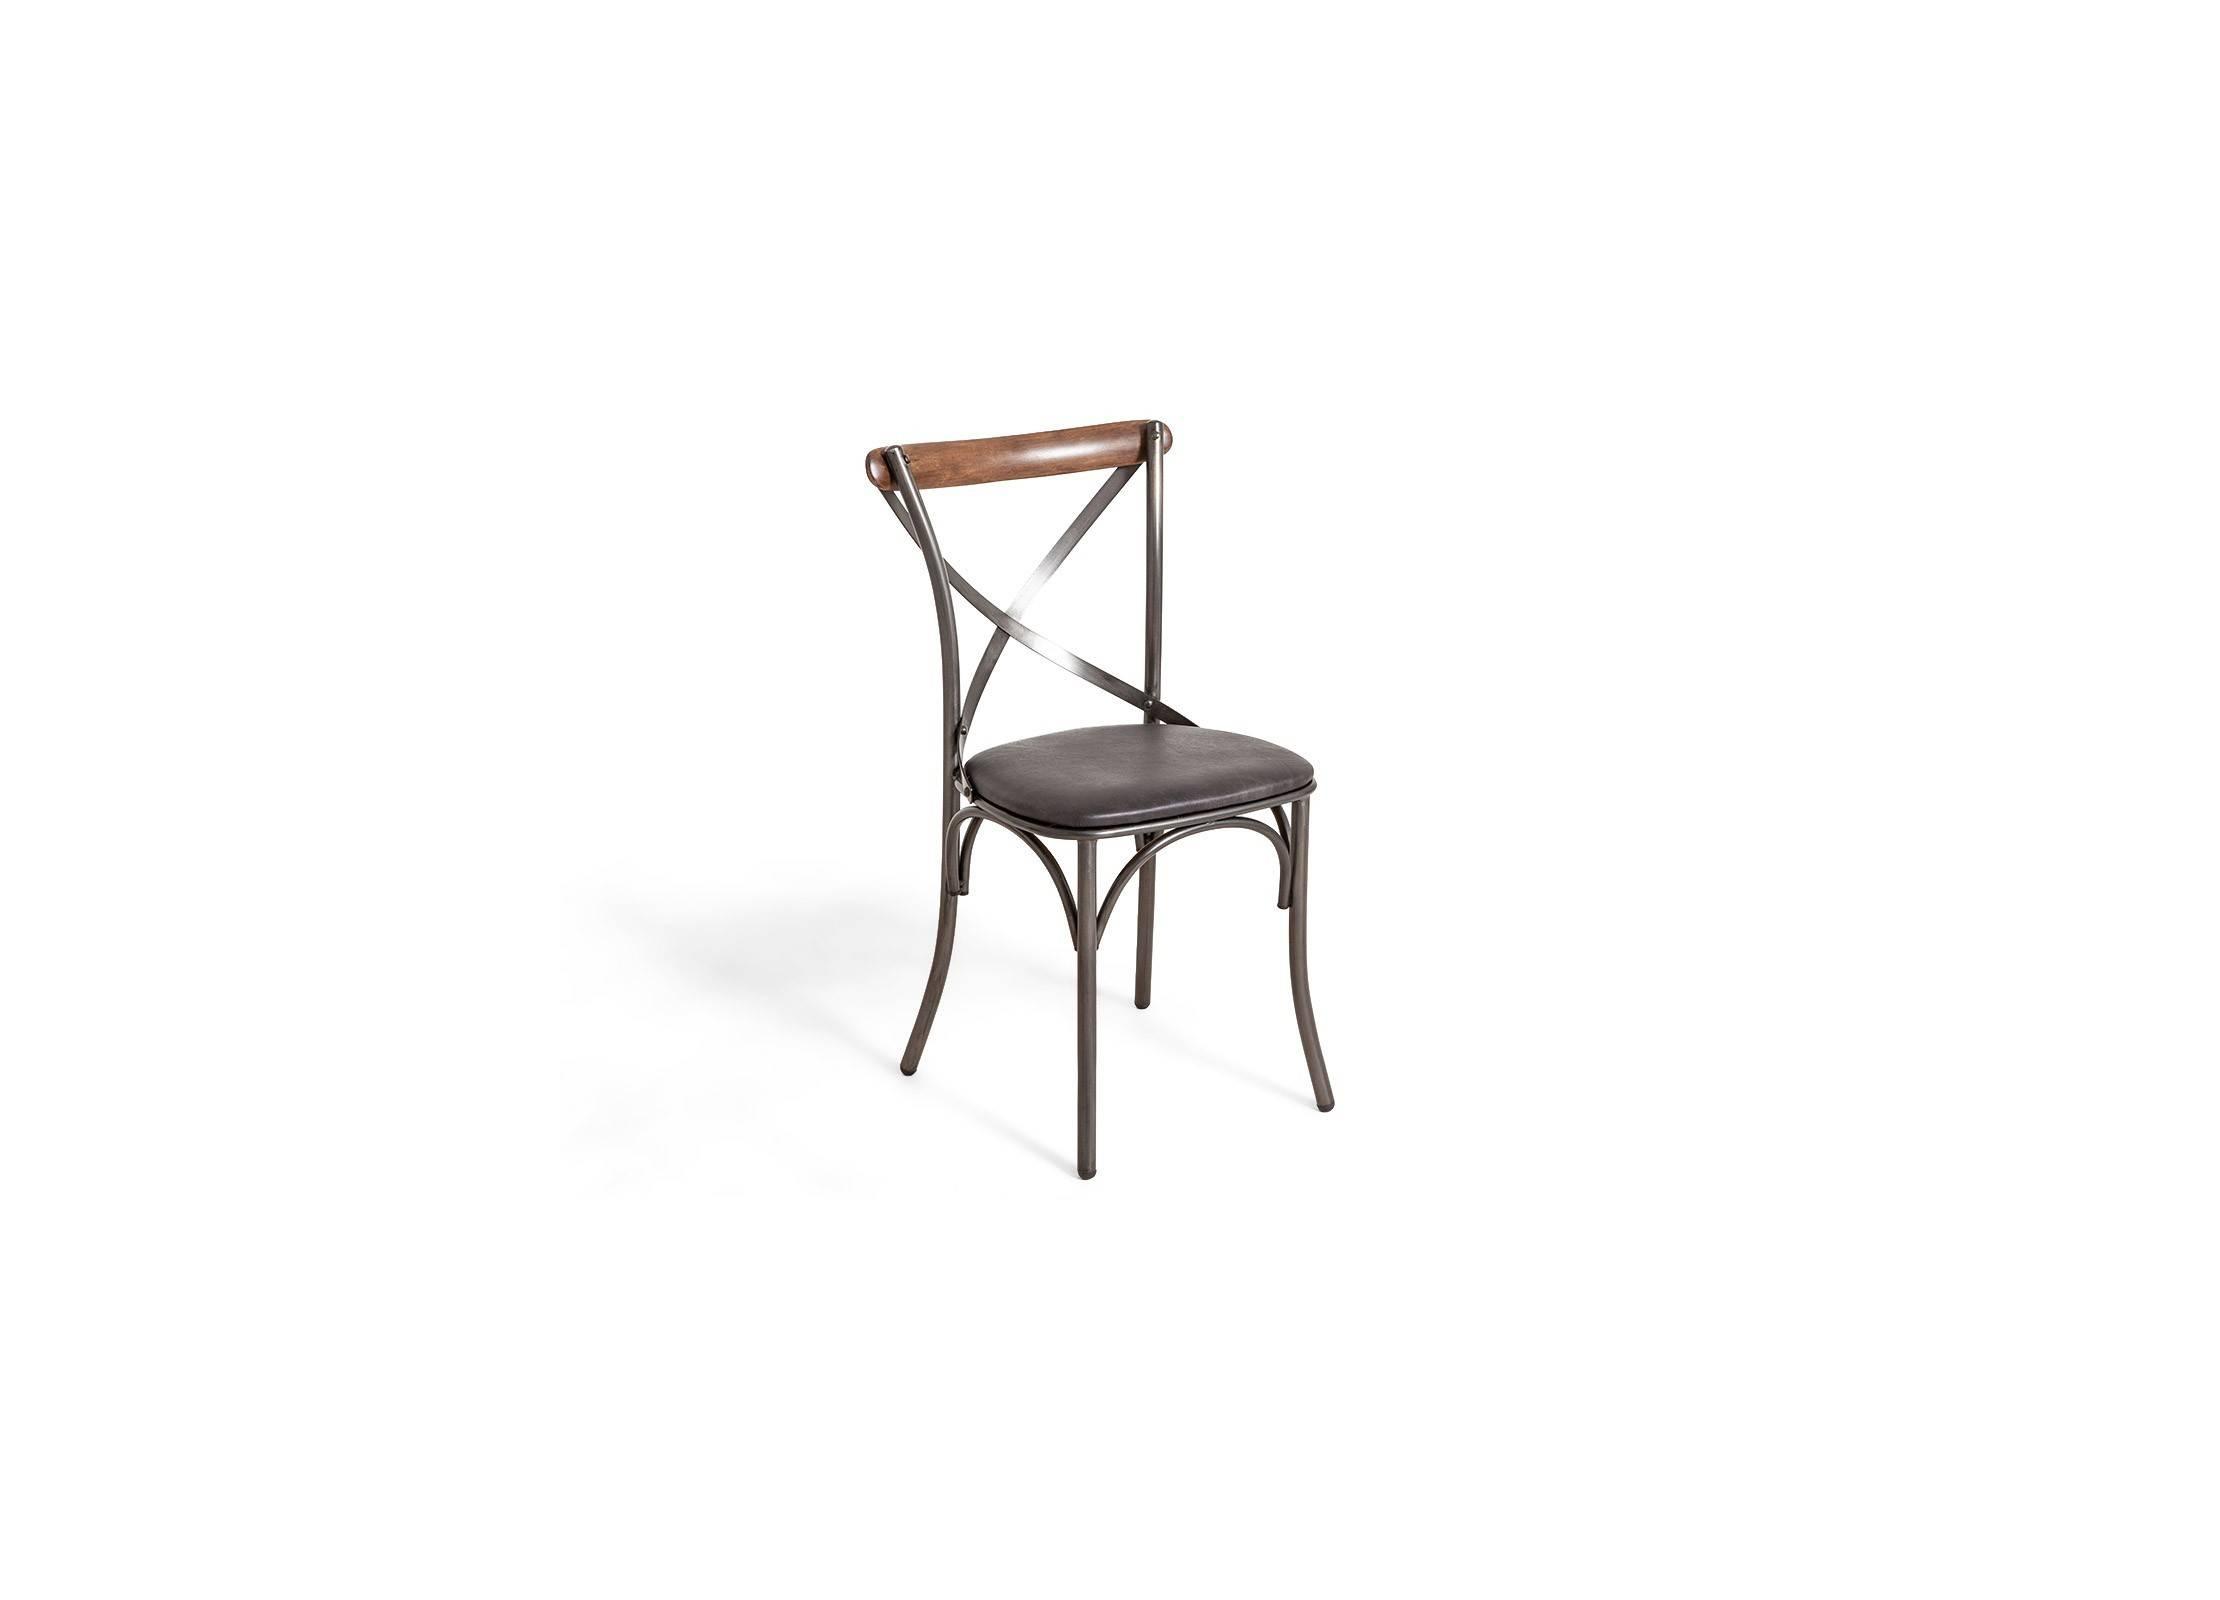 Chaise Eiffel métal avec assise en cuir noir